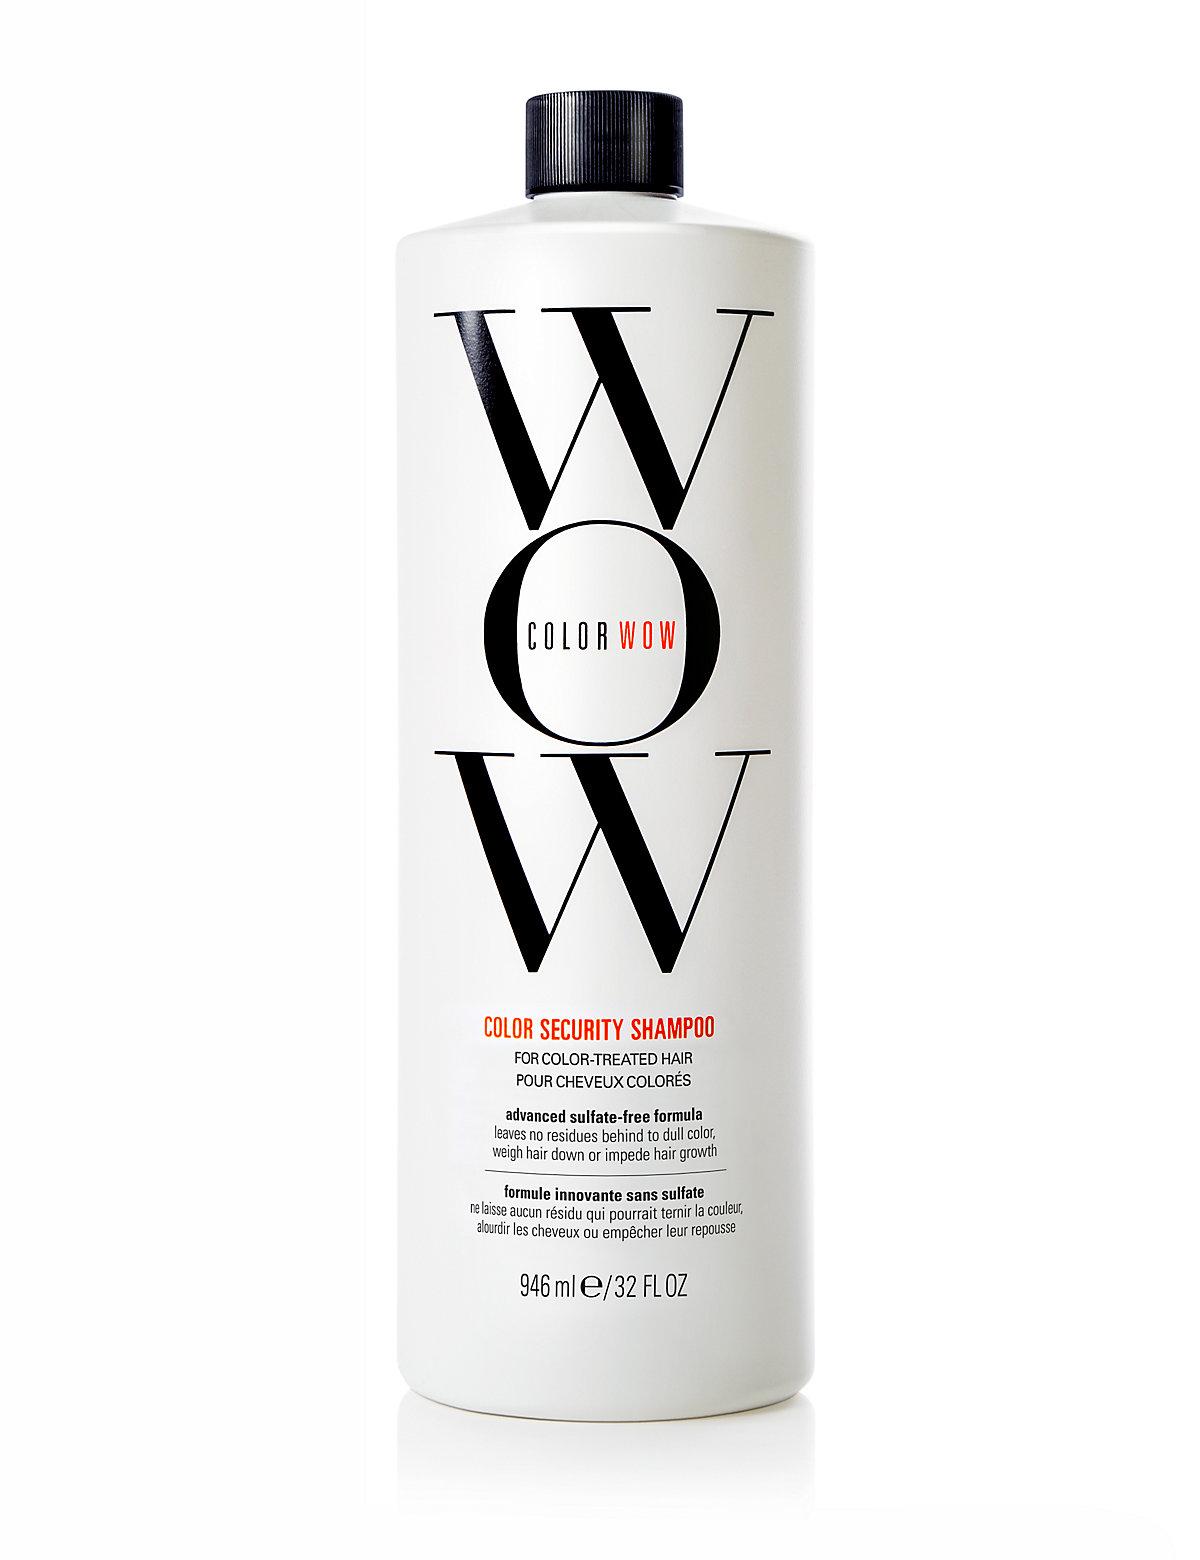 COLOR WOW 1 Litre Large Color Security Shampoo - *Save 27% per ml